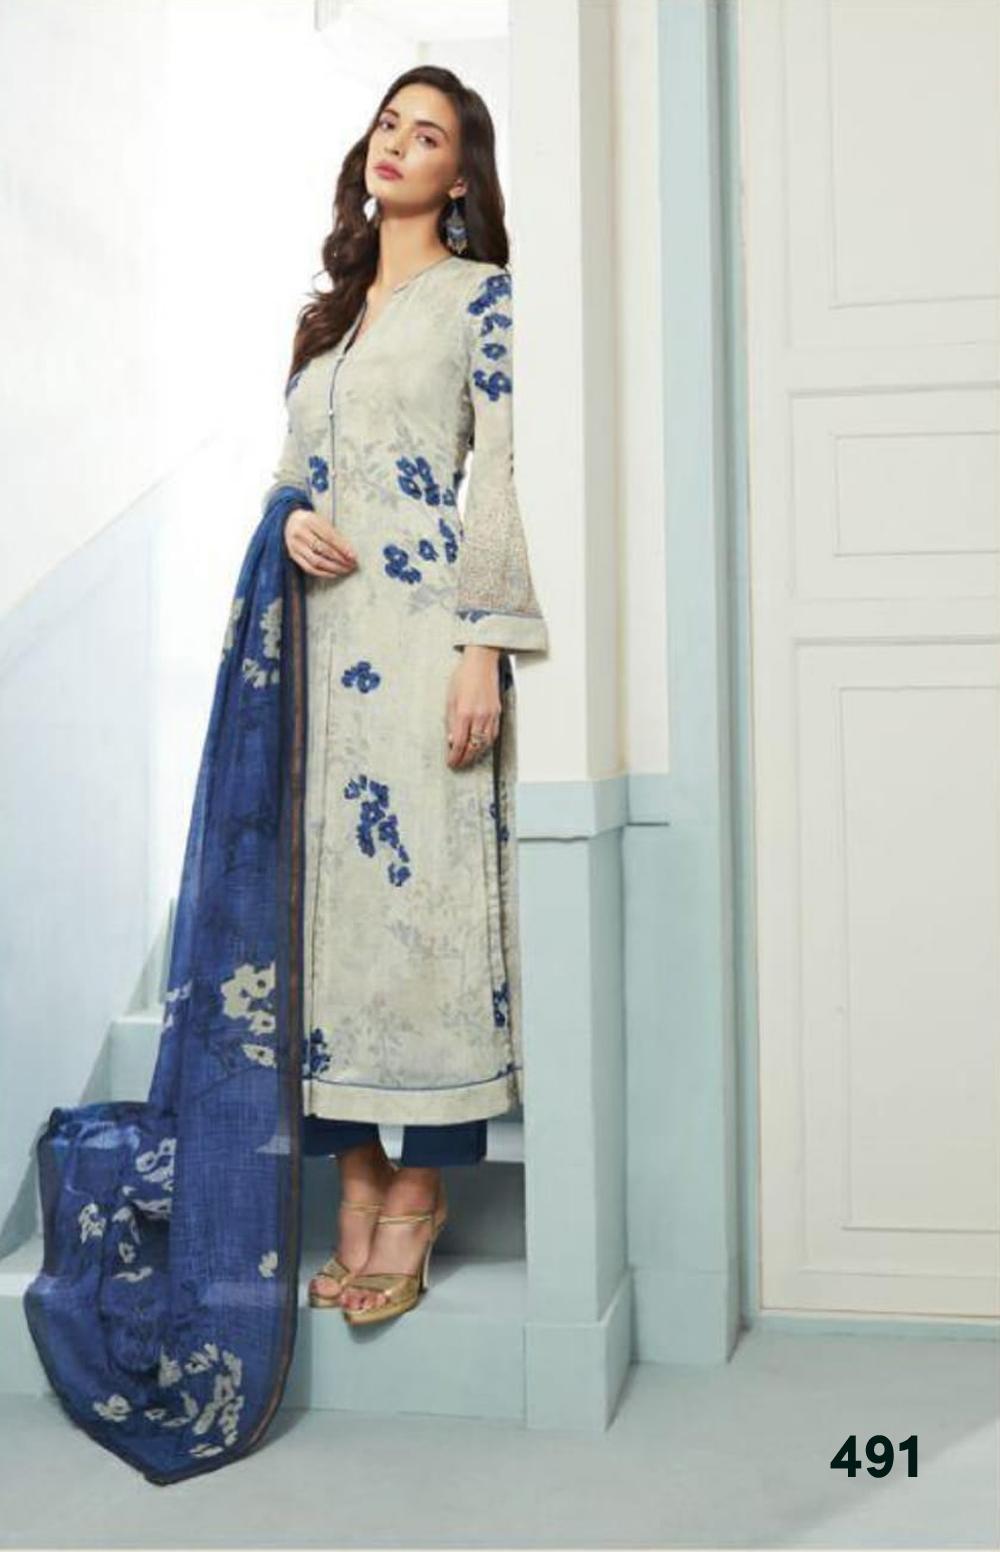 30bcc05da3 Women Shalwar Kameez In Bangladesh At Best Price - Daraz.com.bd